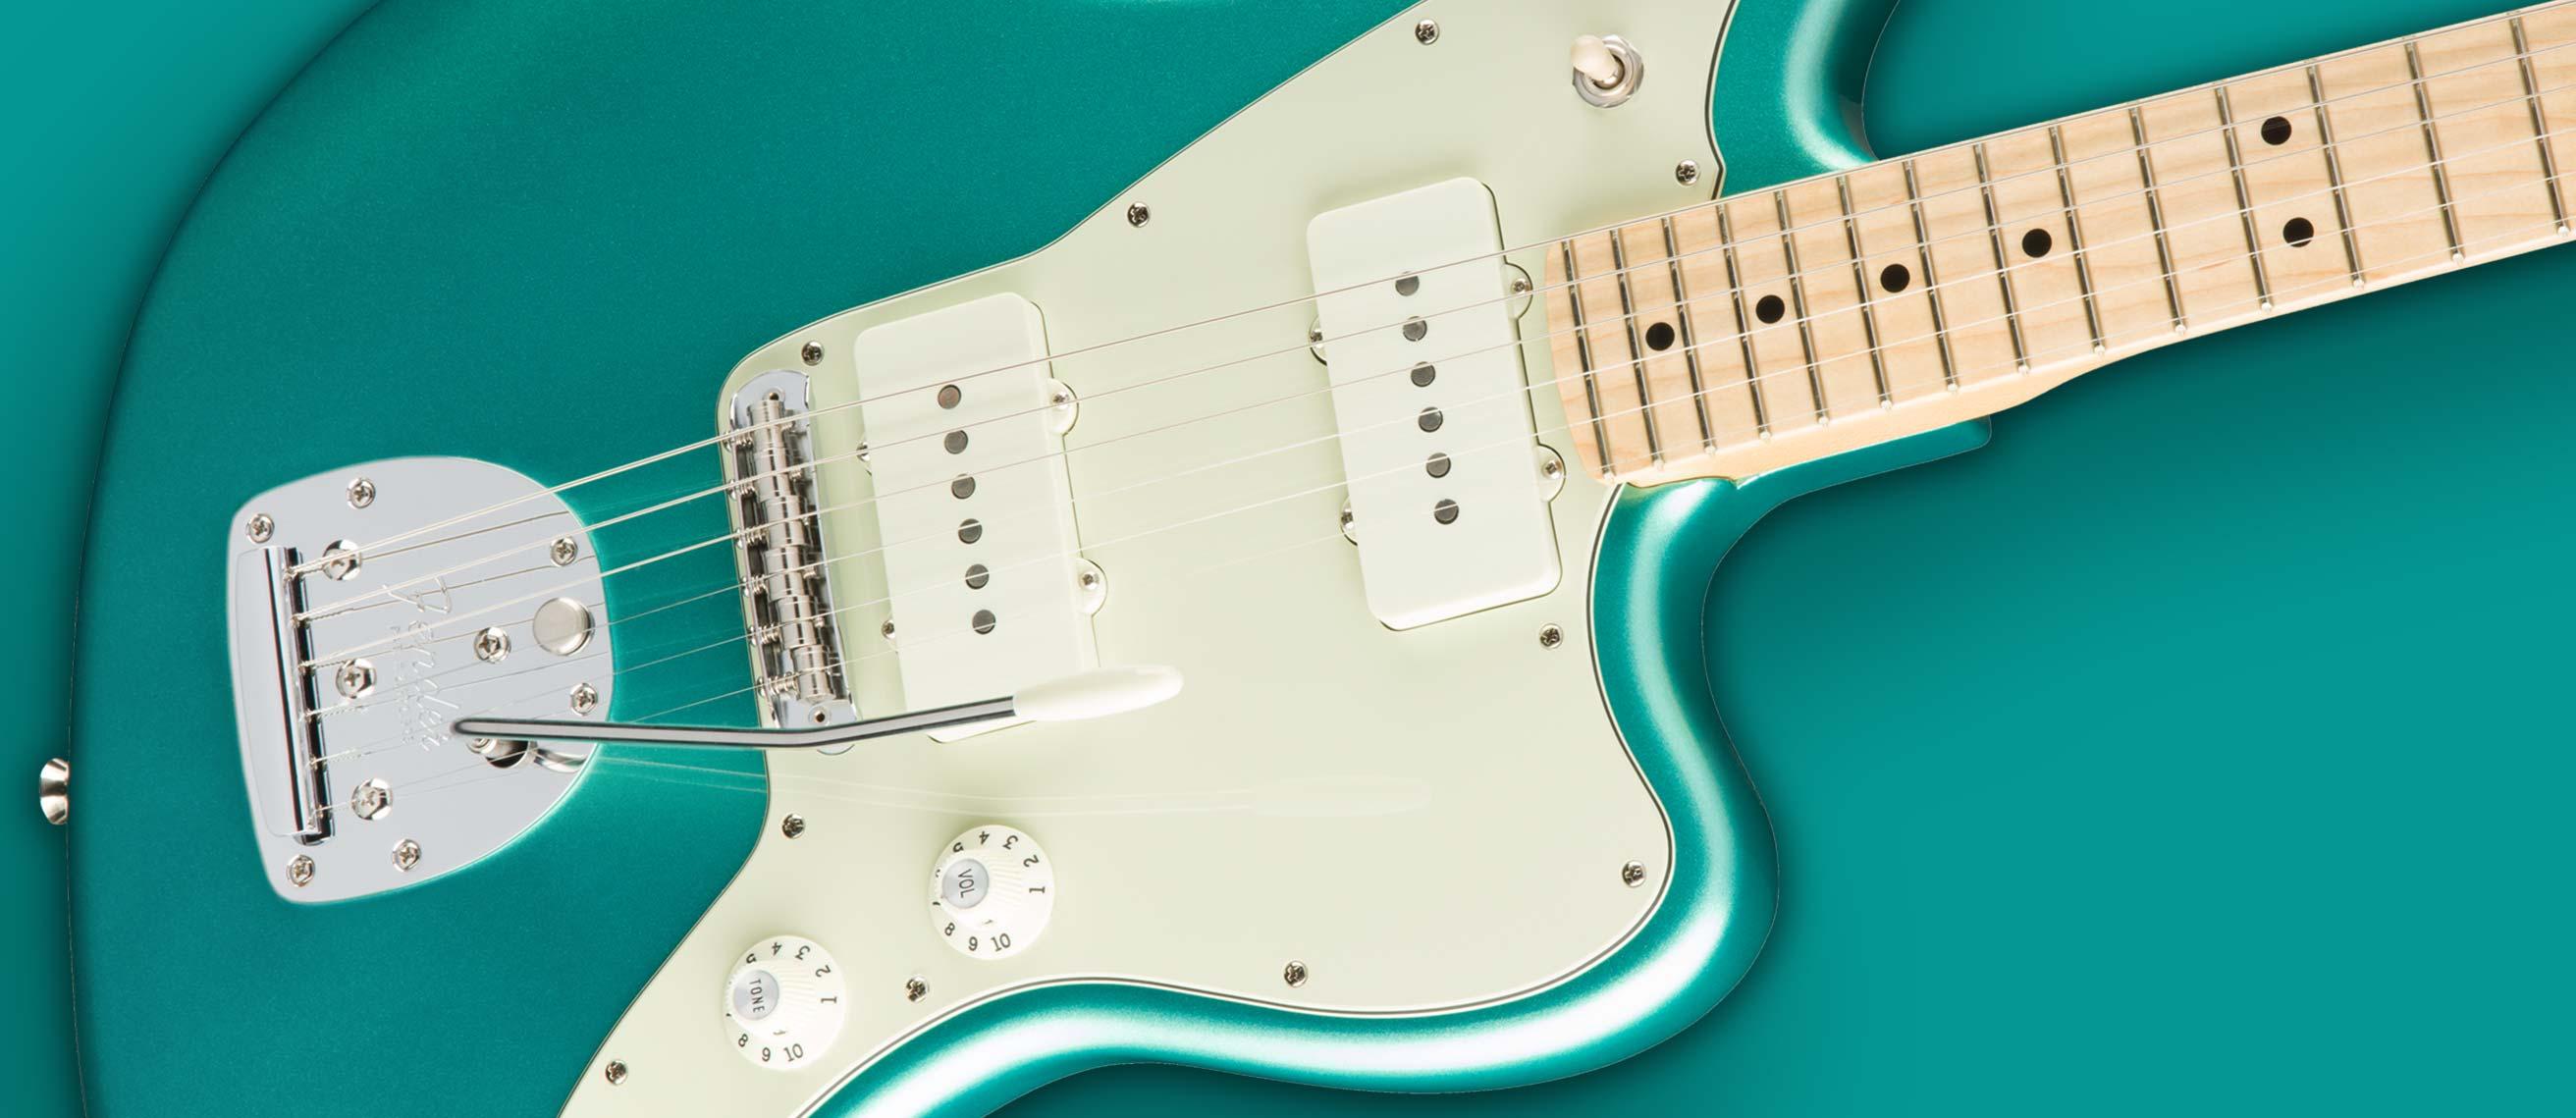 jazzmaster controls explained fender jazzmaster Fender Telecaster Wiring-Diagram Old Guitar Wiring mascis jazzmaster wiring diagram